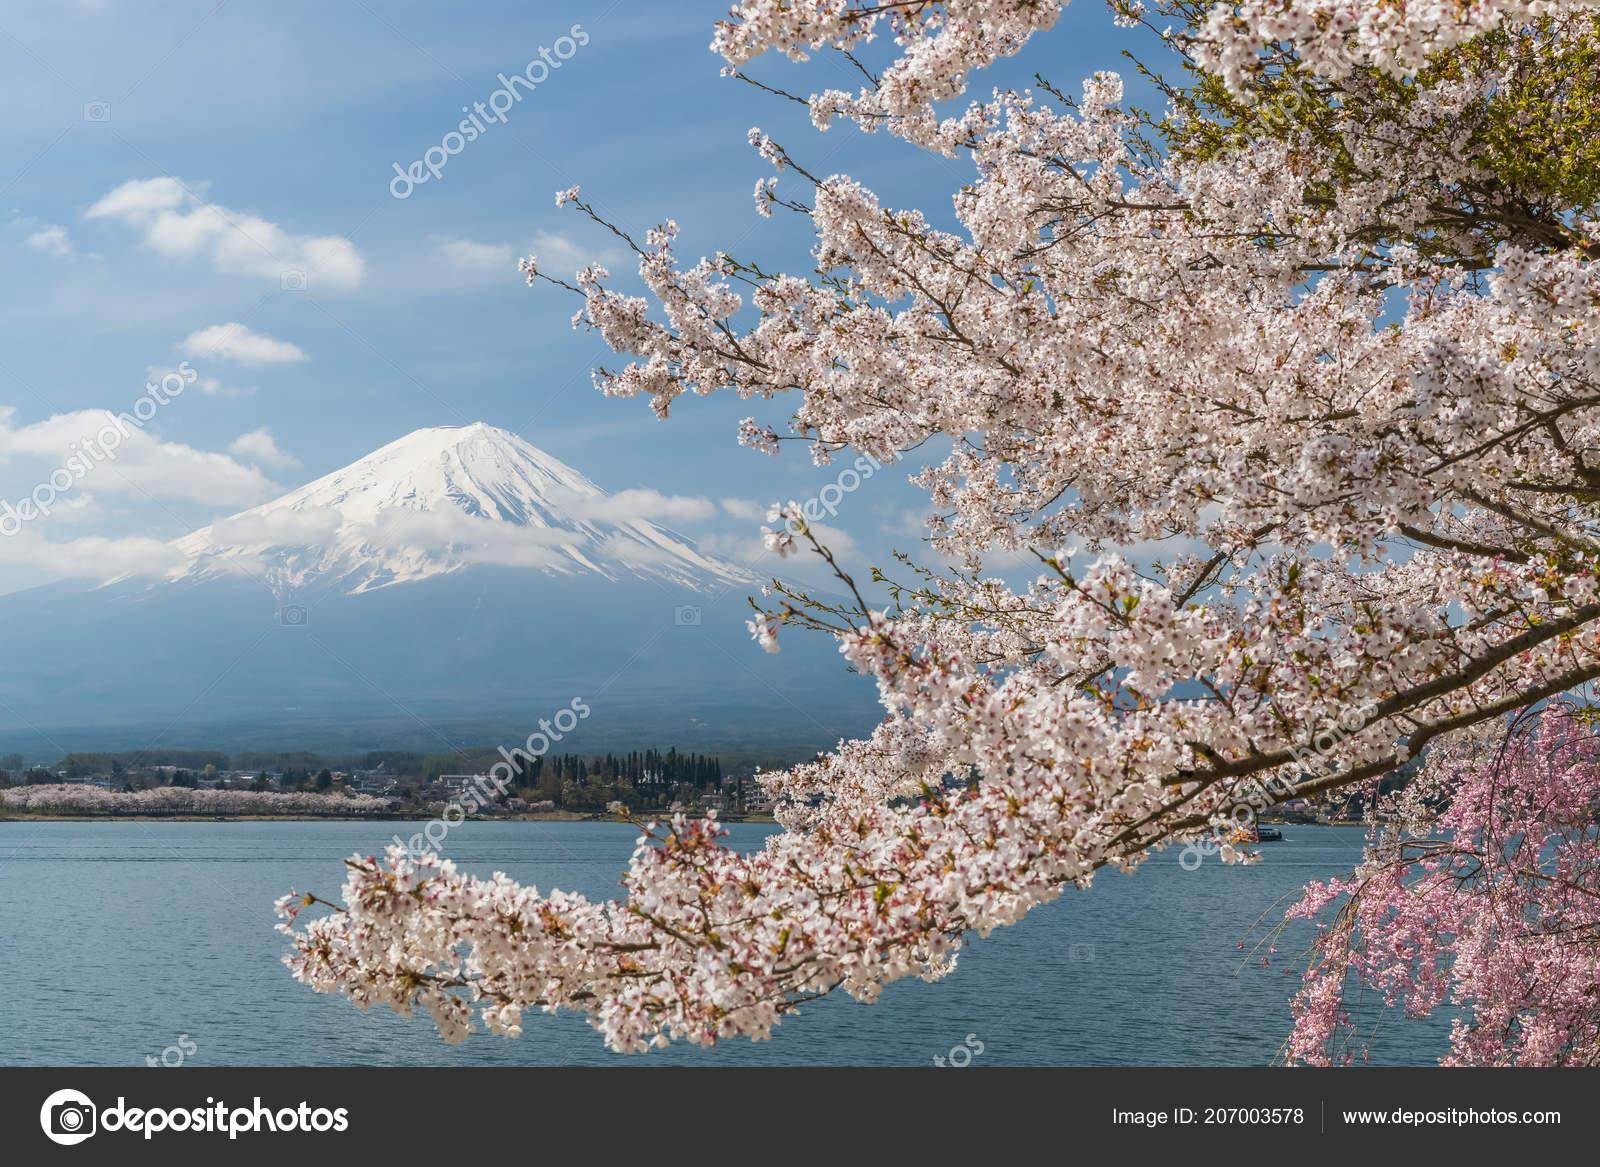 Spring In Japan Wallpaper Sakura Cherry Blossom Fuji